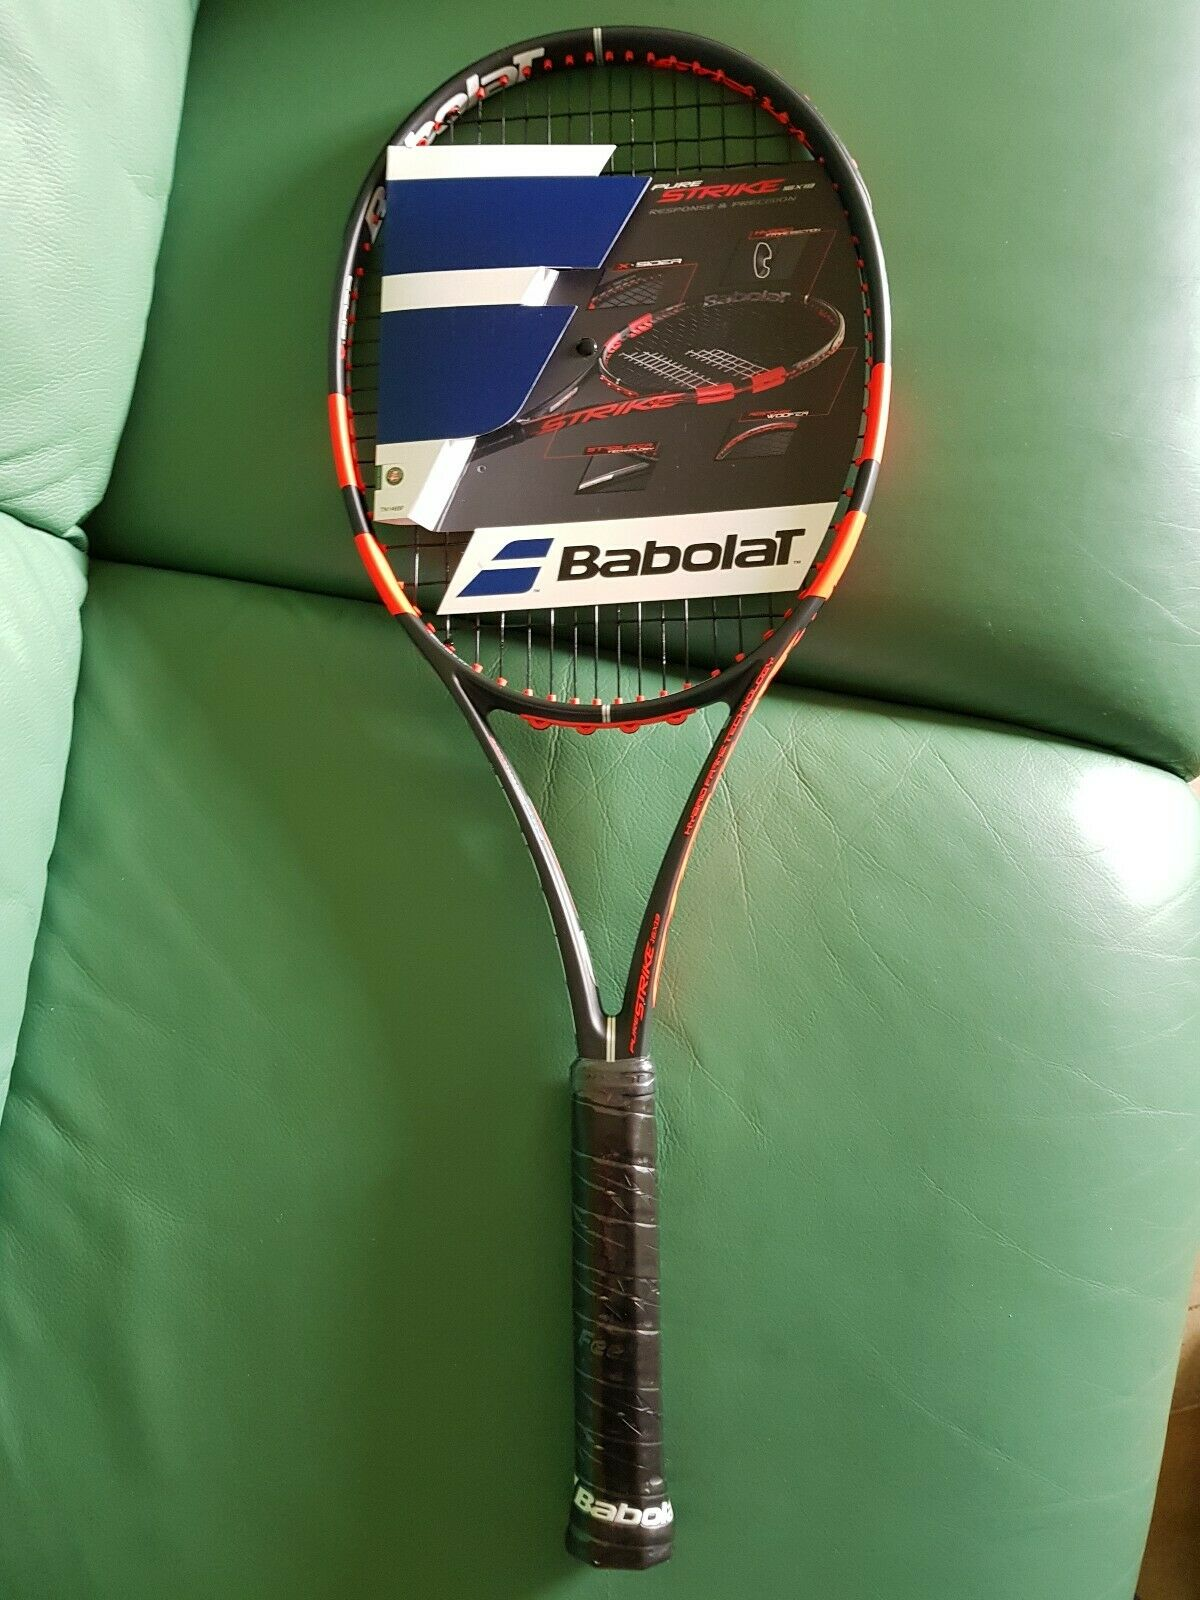 Babolat pure strike 98 (16x19)4 1 2 L4,tennis racquet